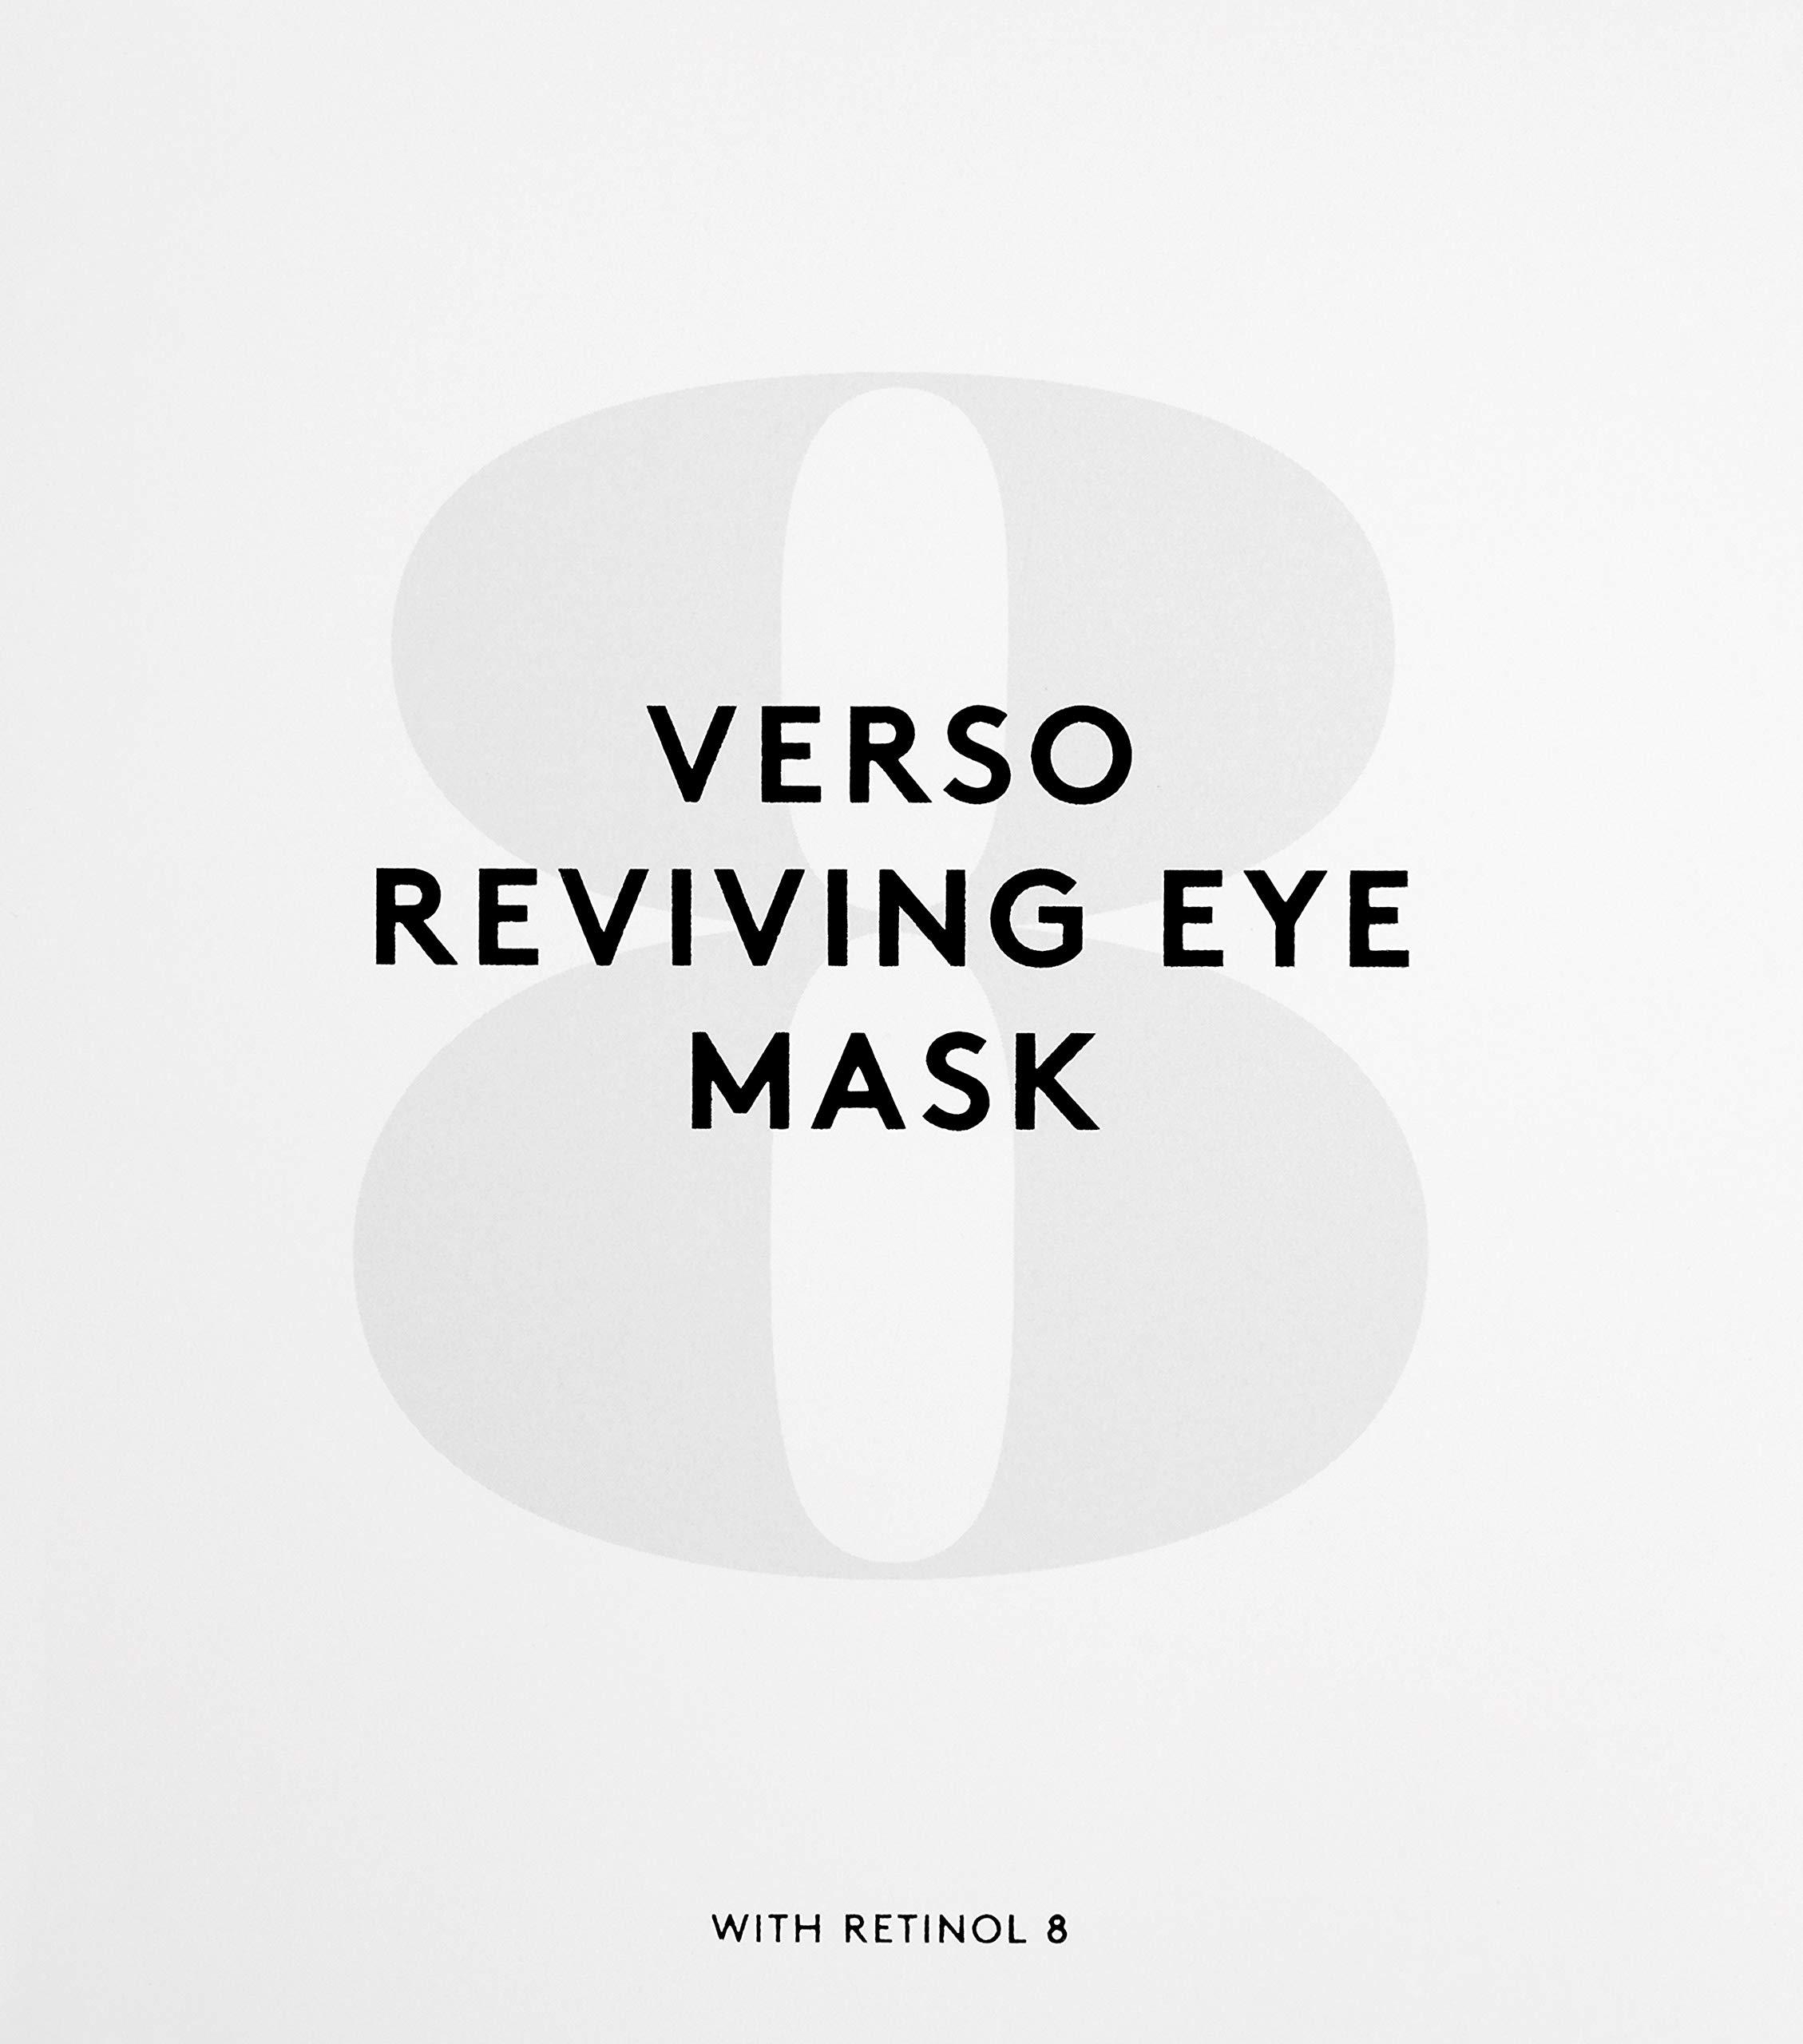 Verso Skincare Reviving Eye Mask, 4 Count